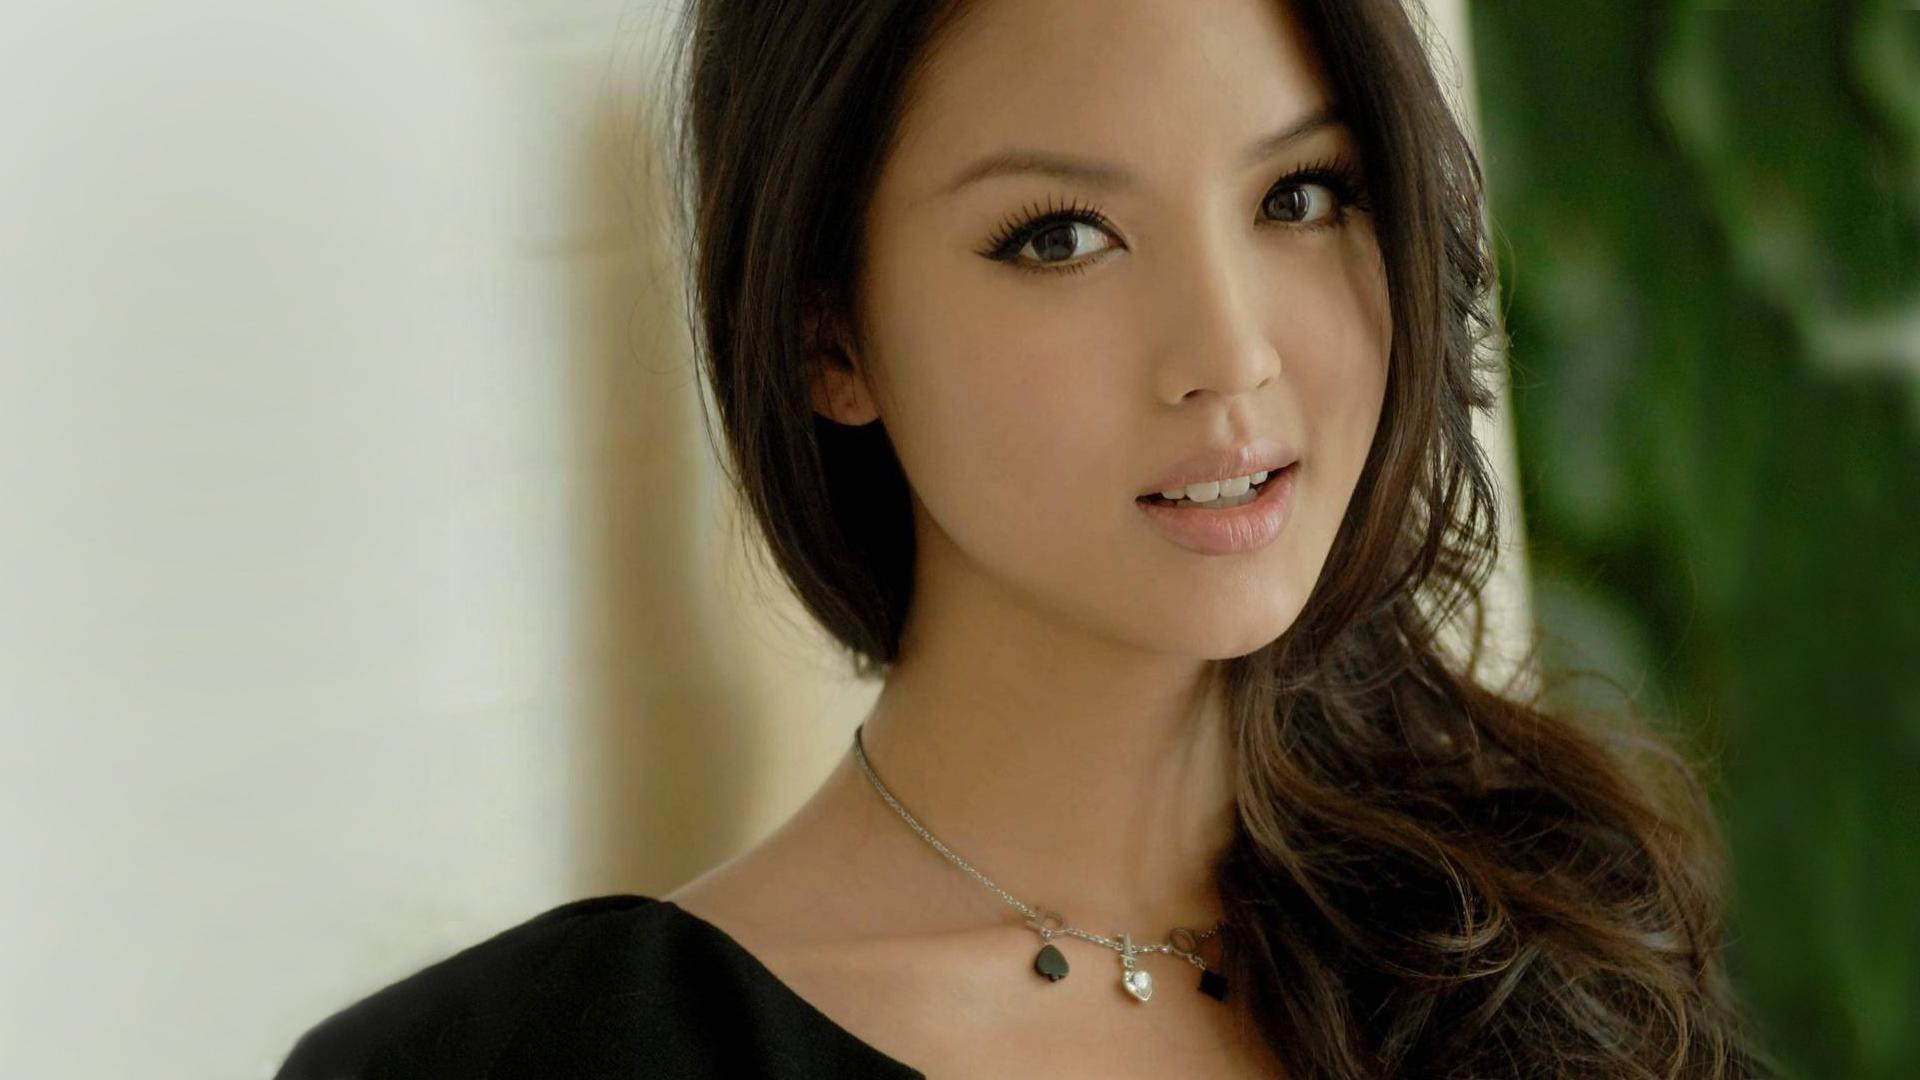 Азиатки - Смотреть порно видео онлайн